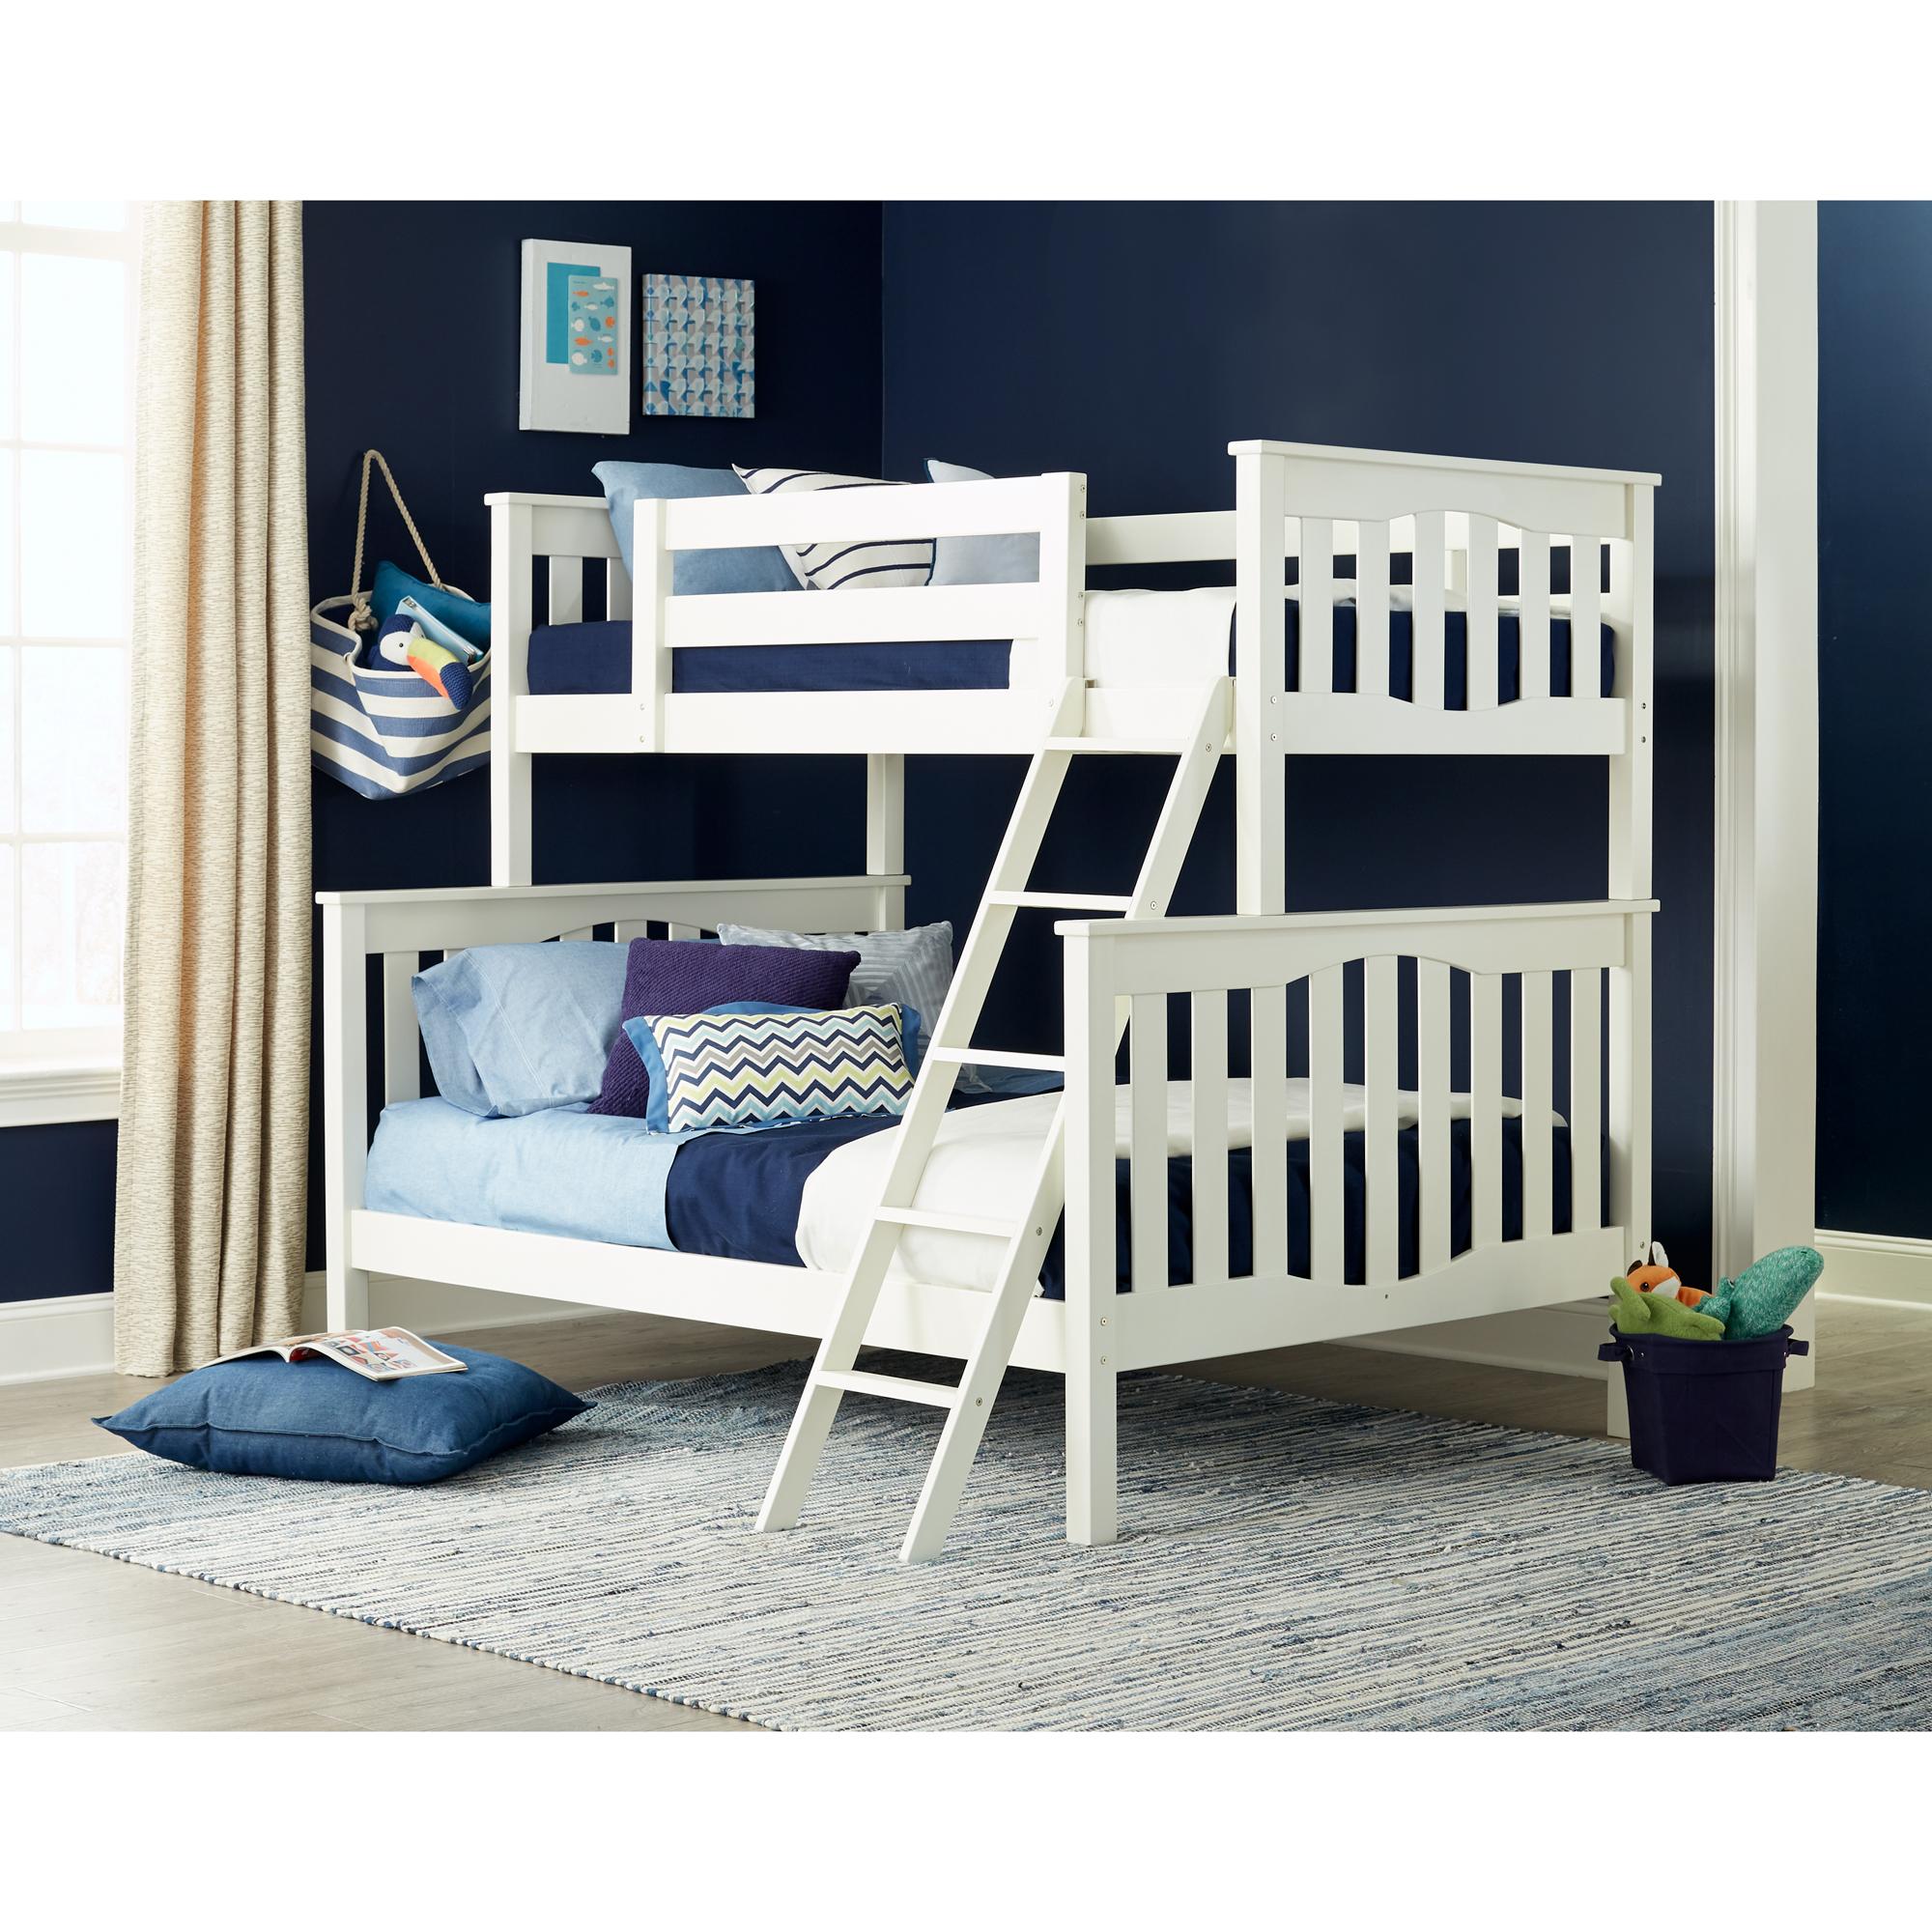 Seneca Twin Over Full Bunk Bed | Epoch Design